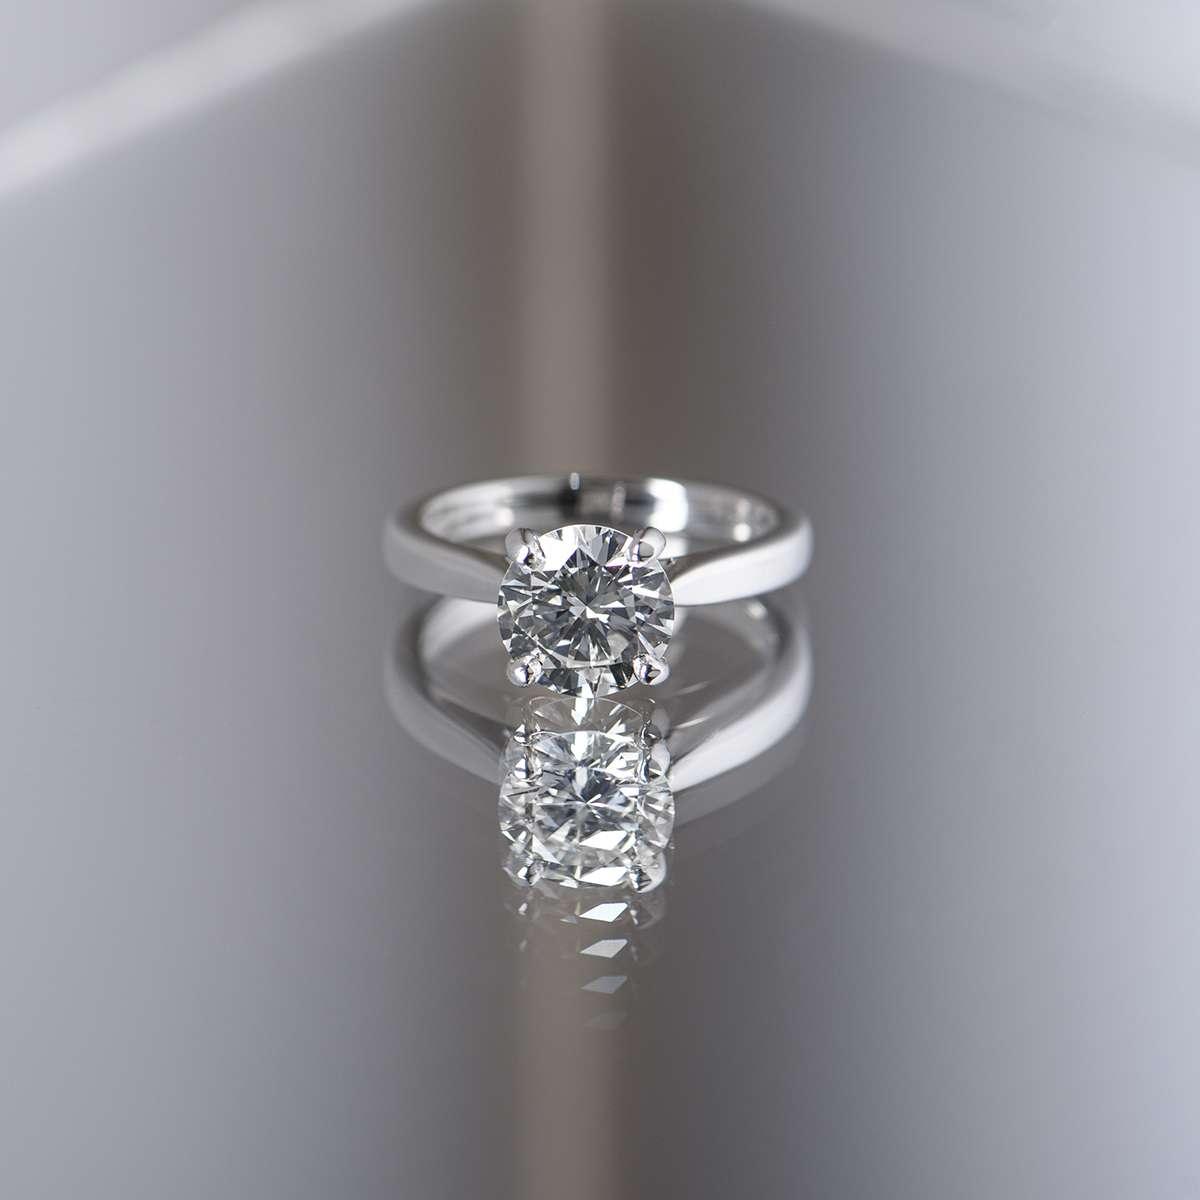 Platinum Round Brilliant Cut Diamond Ring 2.01ct I/VVS2 XXX